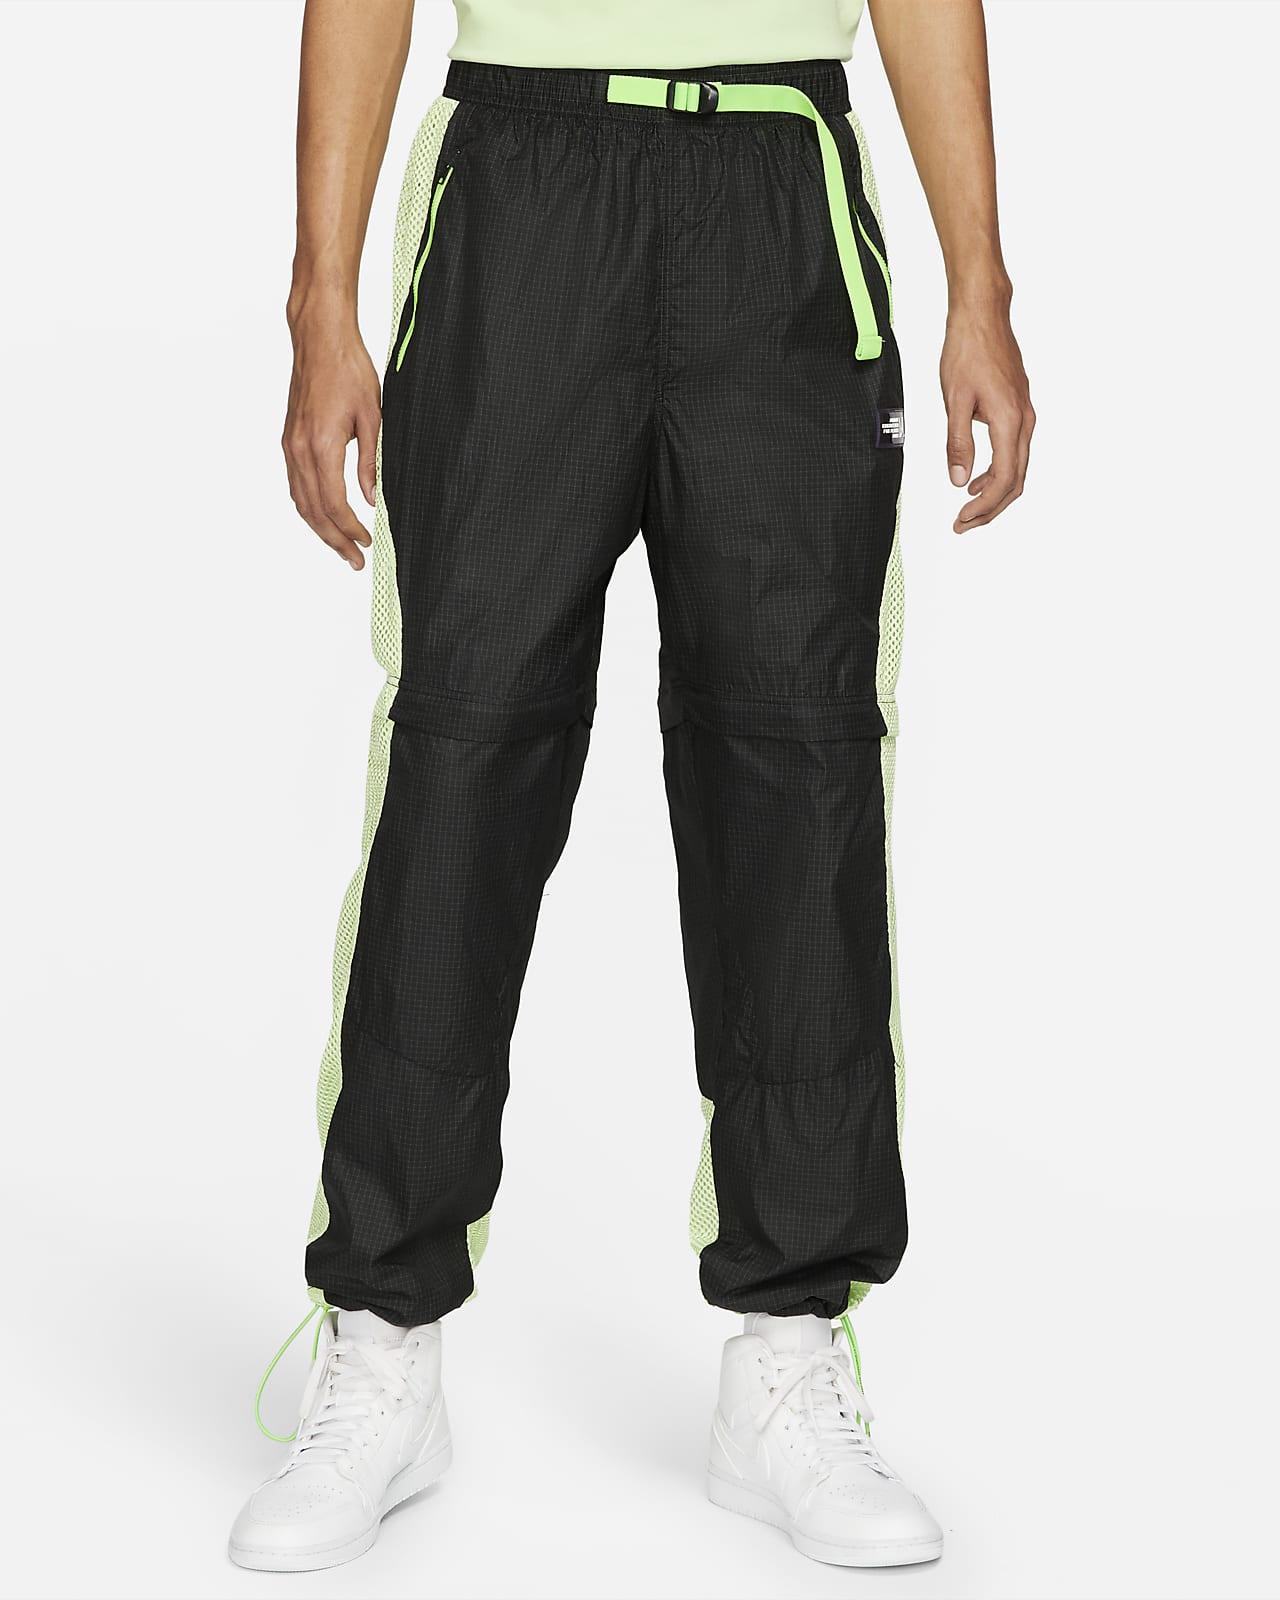 Track pants Jordan 23 Engineered - Uomo